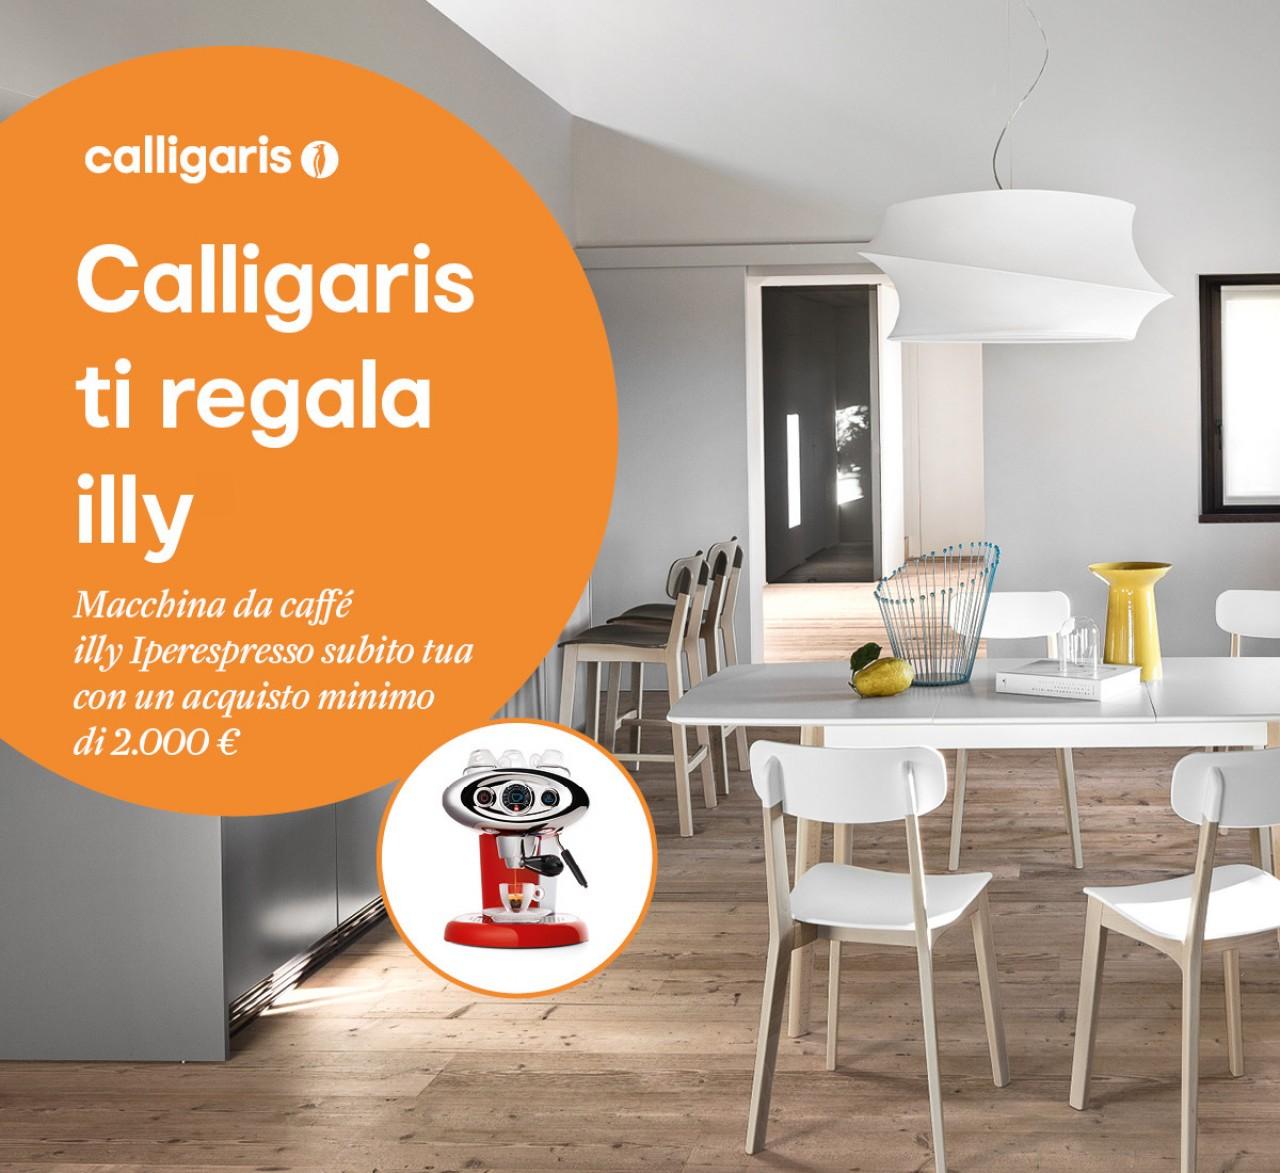 Calligaris regala illy offerte calligaris torino for Ad arredamenti torino